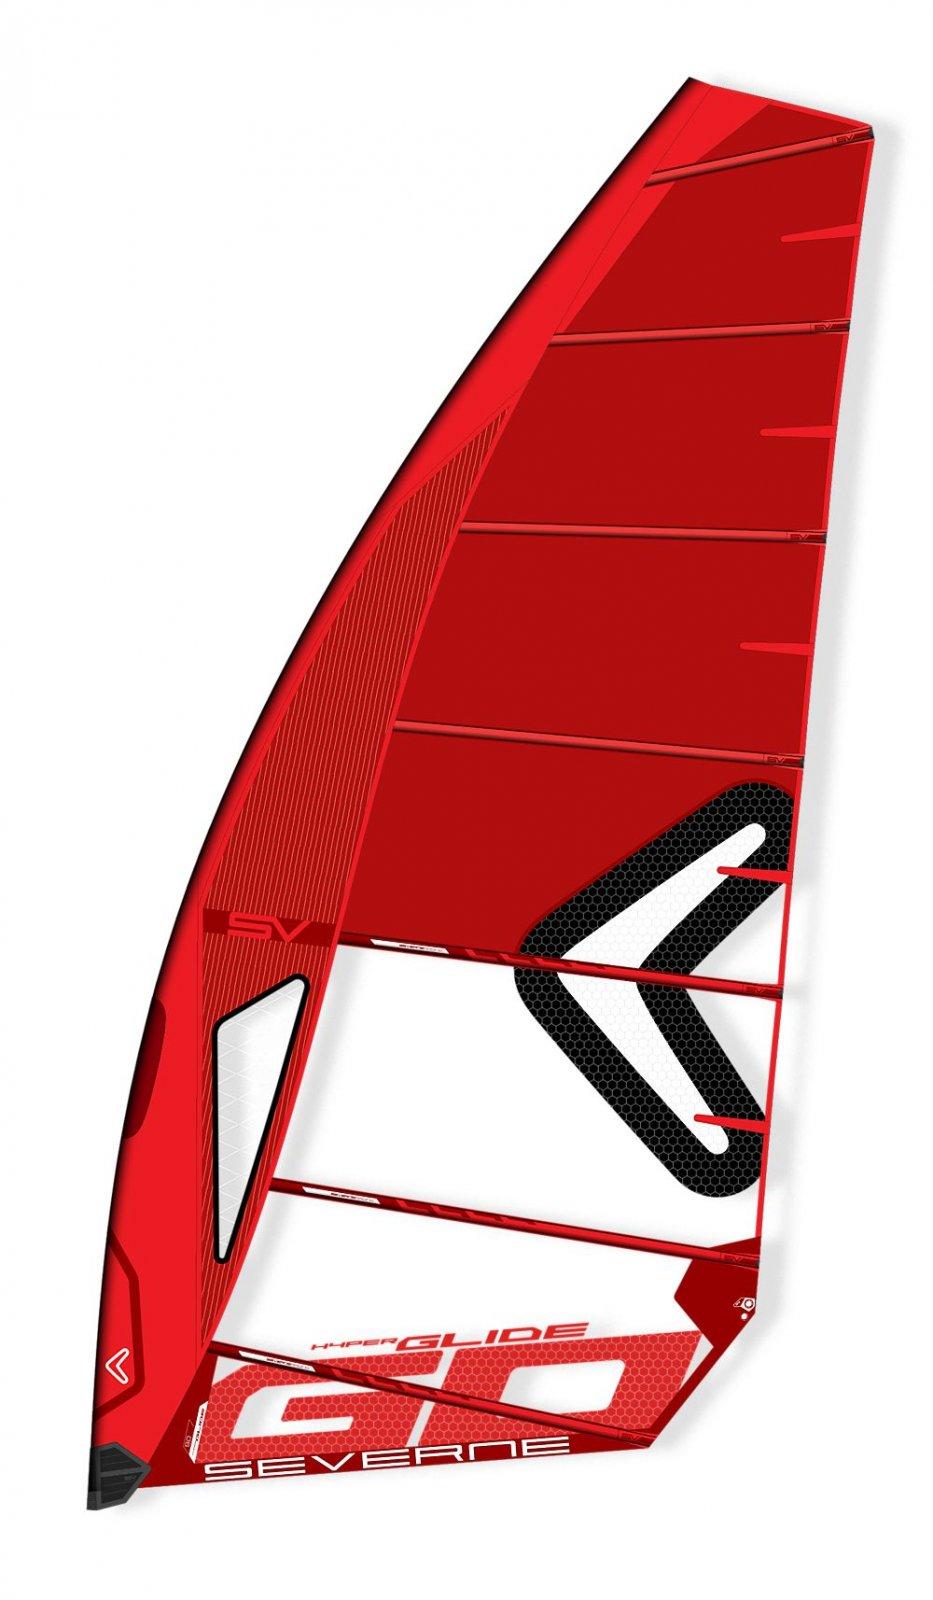 Severne HGO iQ Foil Race Sail